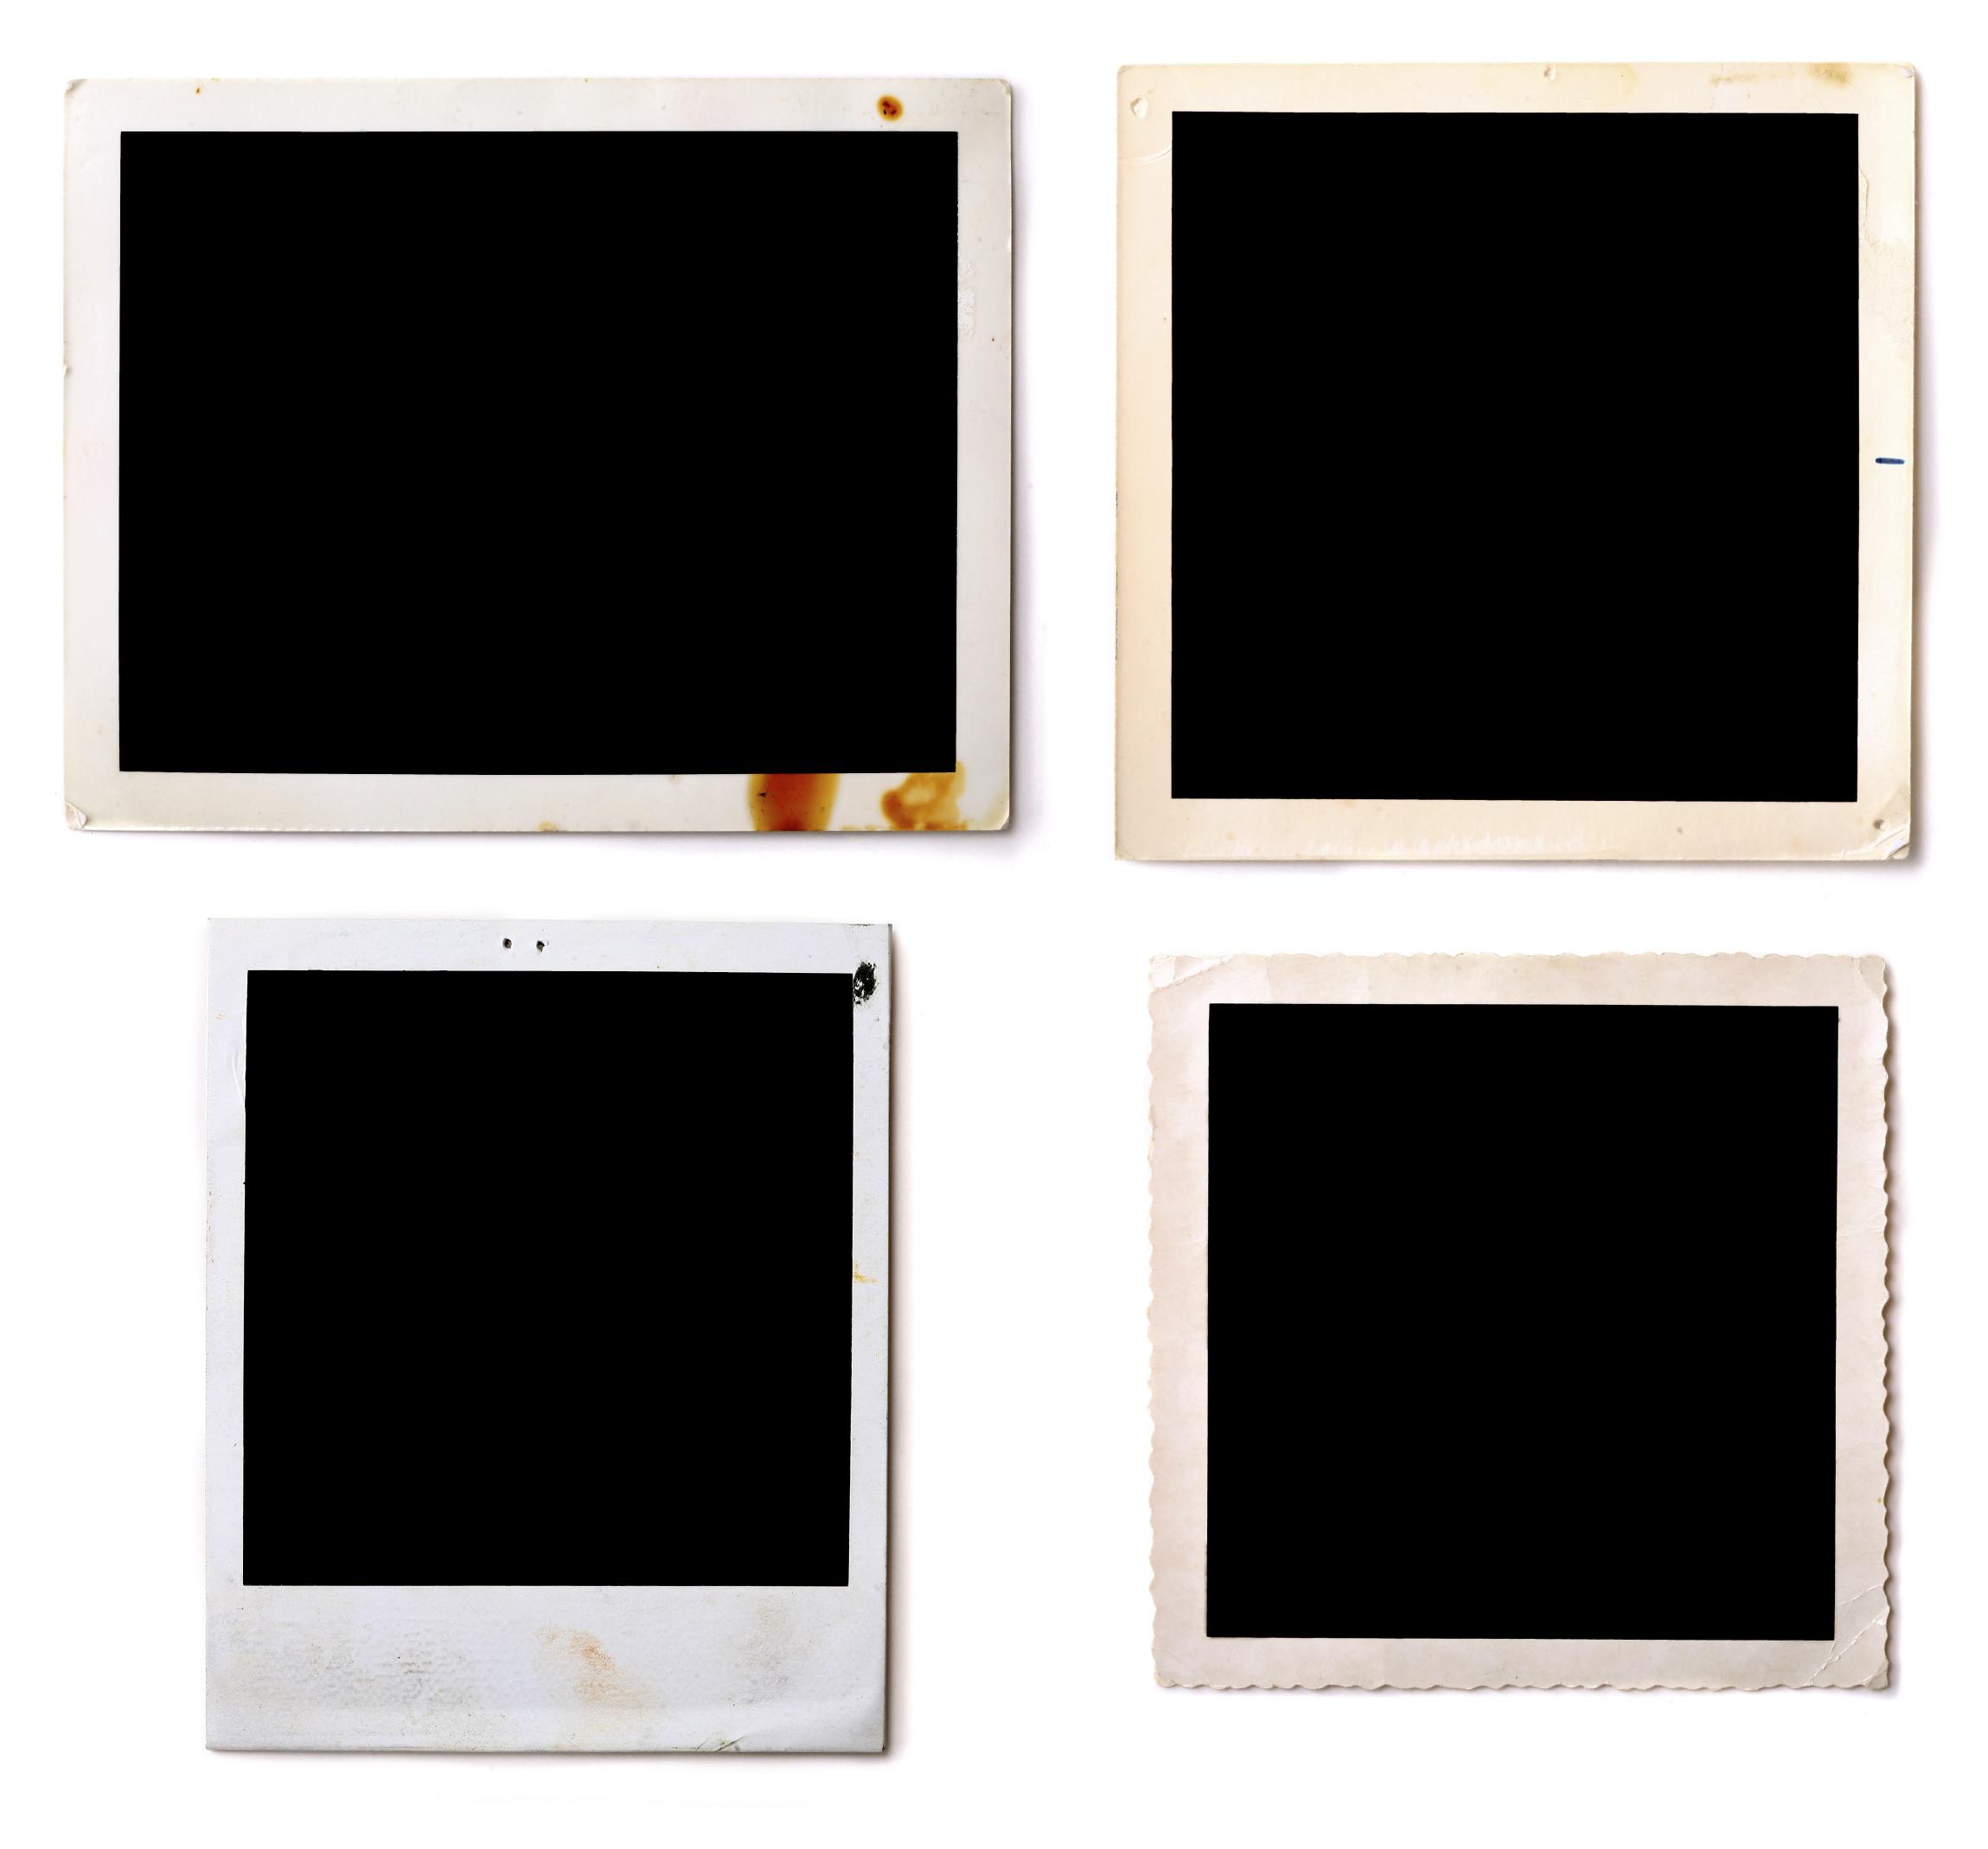 15 PSD Polaroid Template Photoshop Images - Free Polaroid Template ...